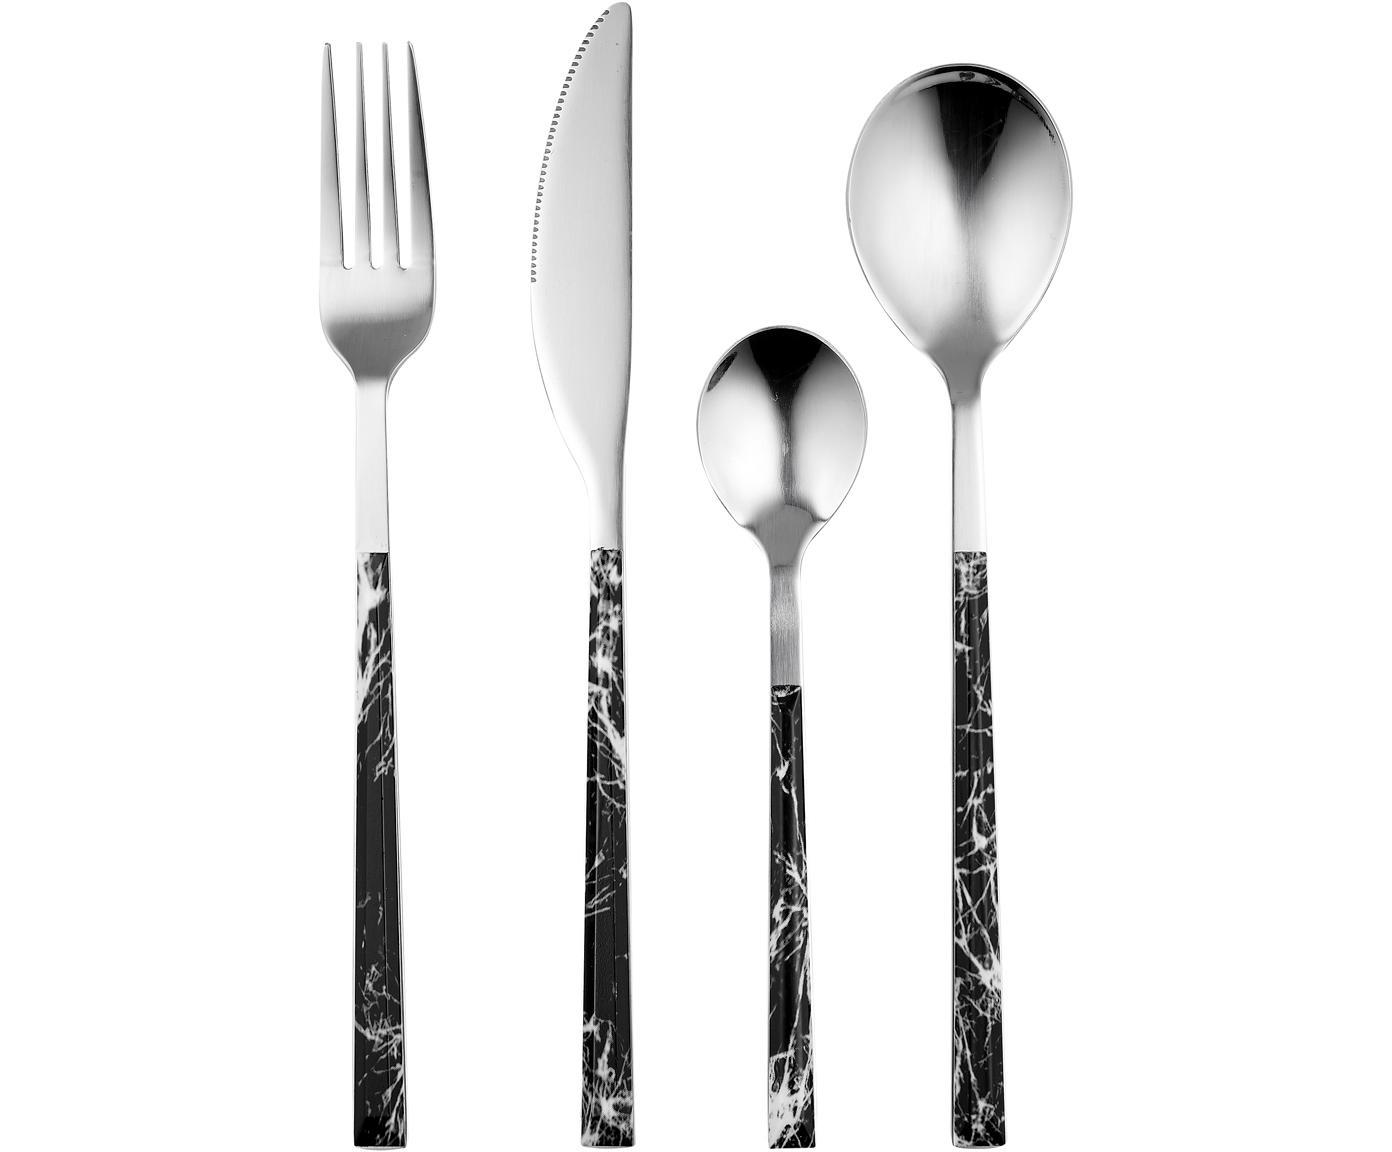 Besteck-Set Oslo mit Griffen in Marmoroptik, 4 Personen (16-tlg.), Griff: Kunststoff (ABS), Schwarz, marmoriert, Edelstahl, L 23 cm